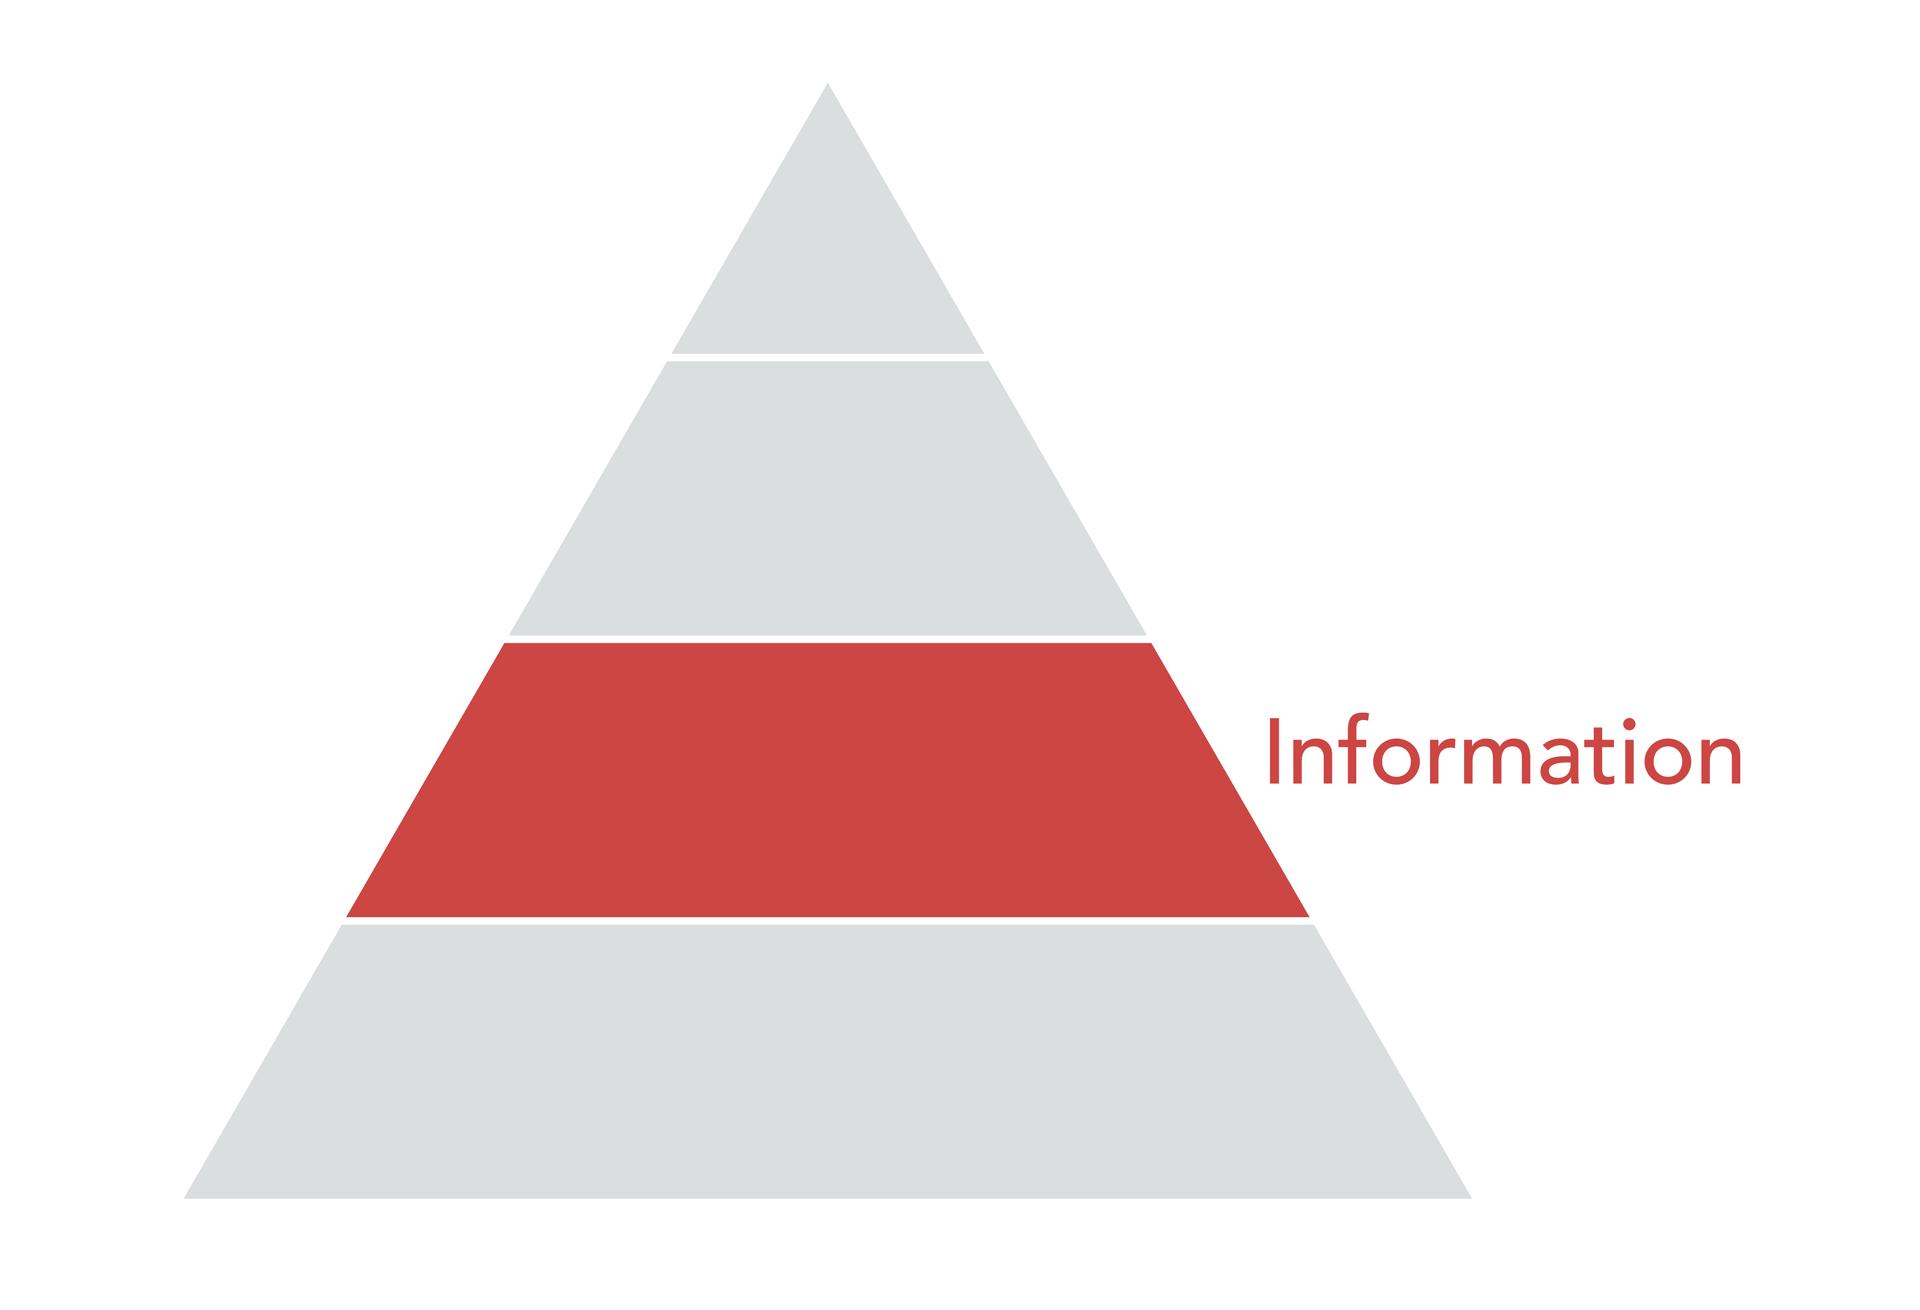 Data Pyramid, information layer.